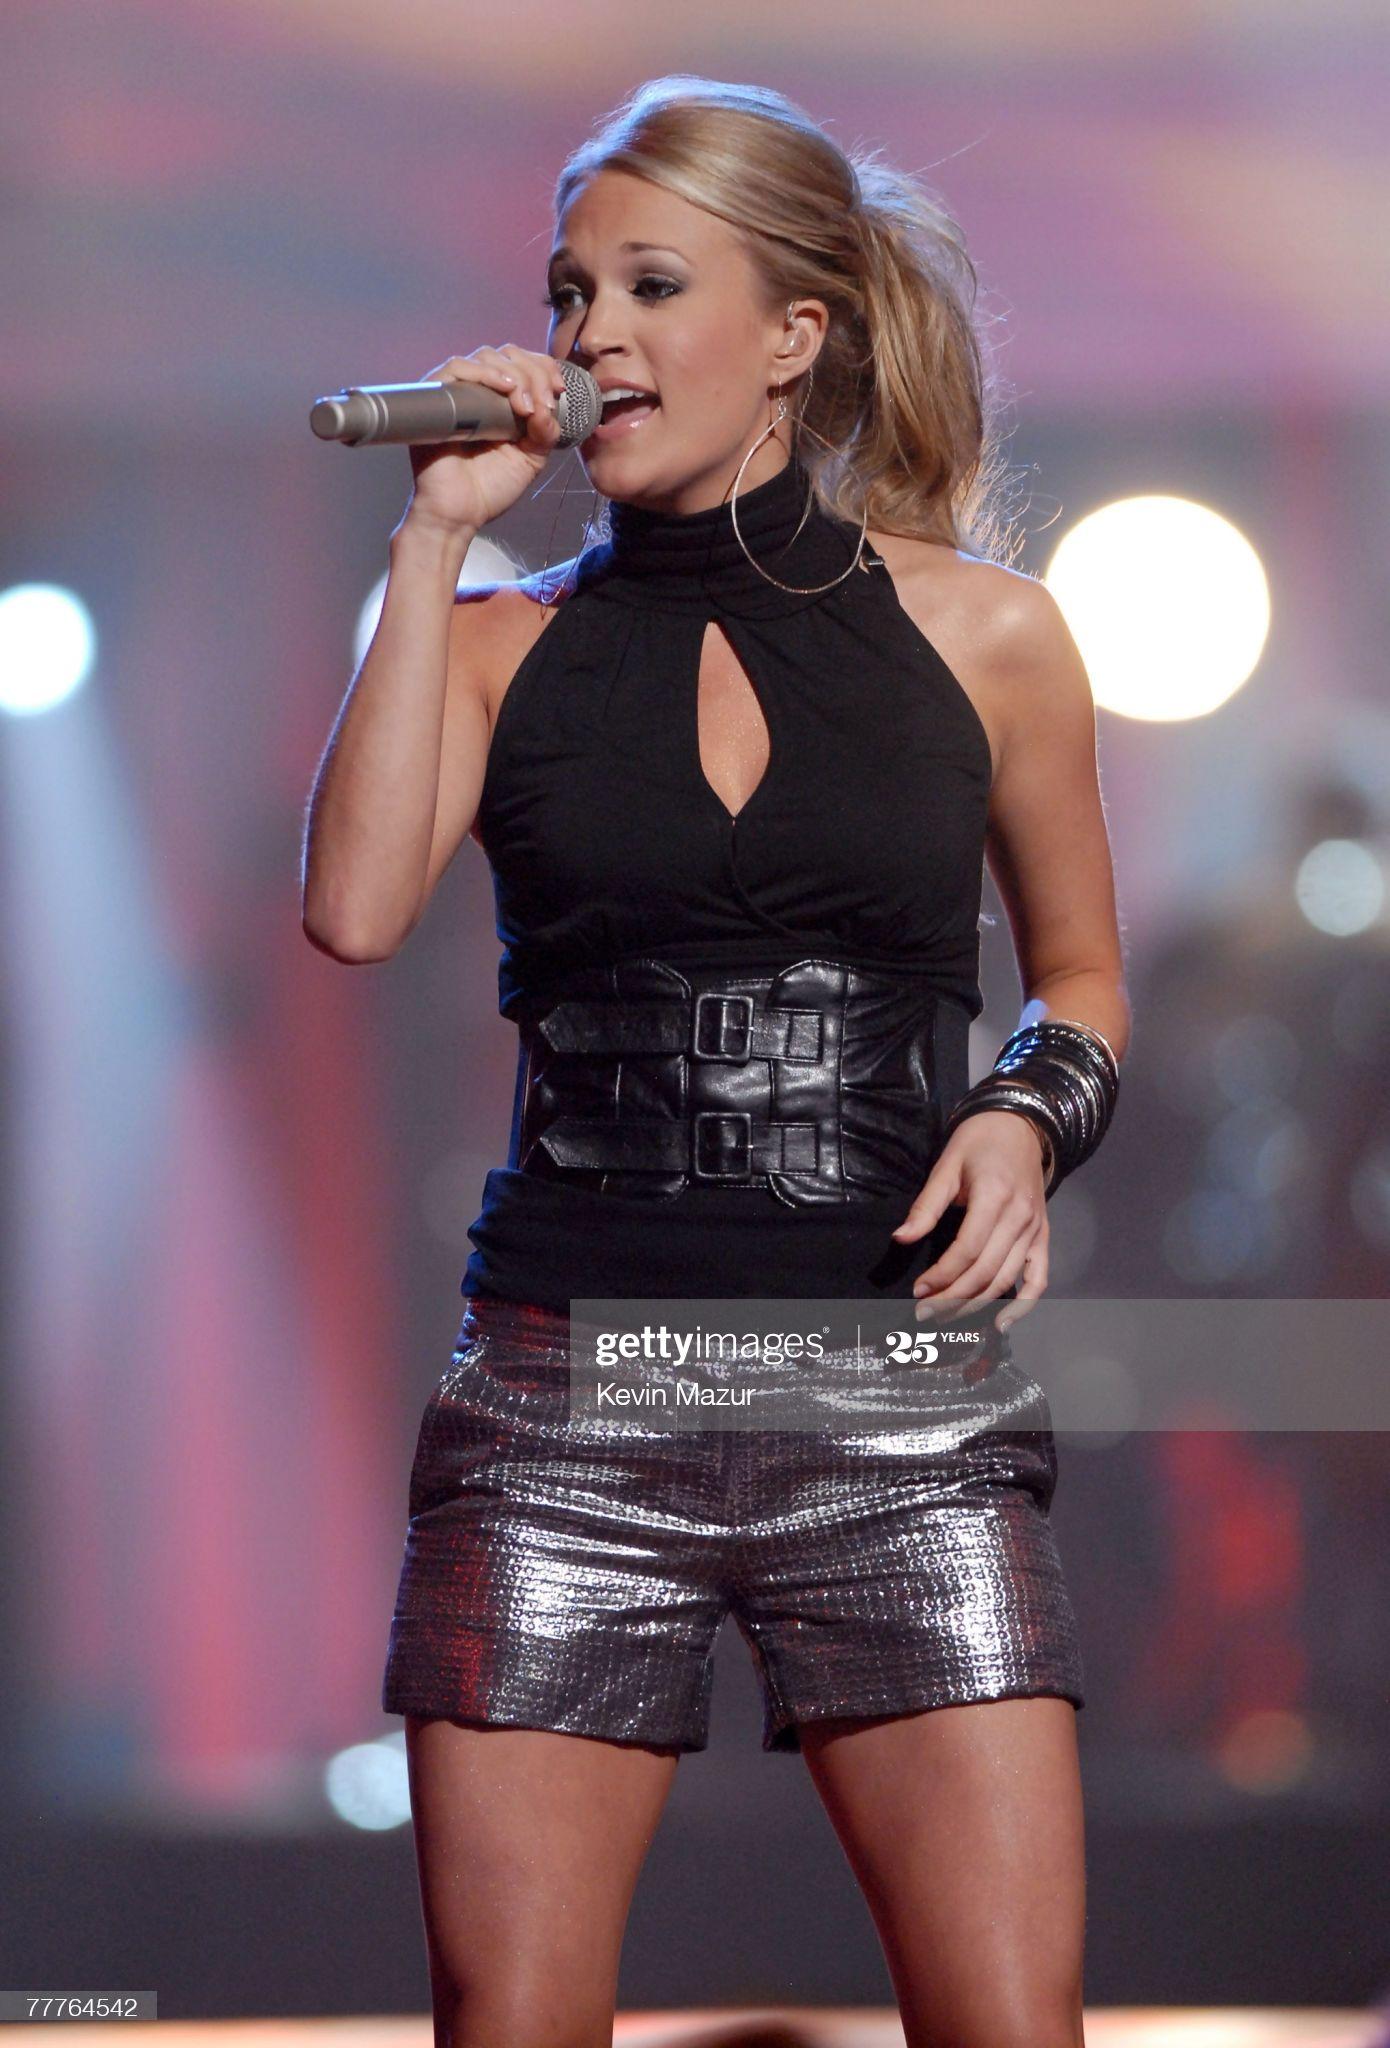 Carrie Underwood puts on leggy display in longest show